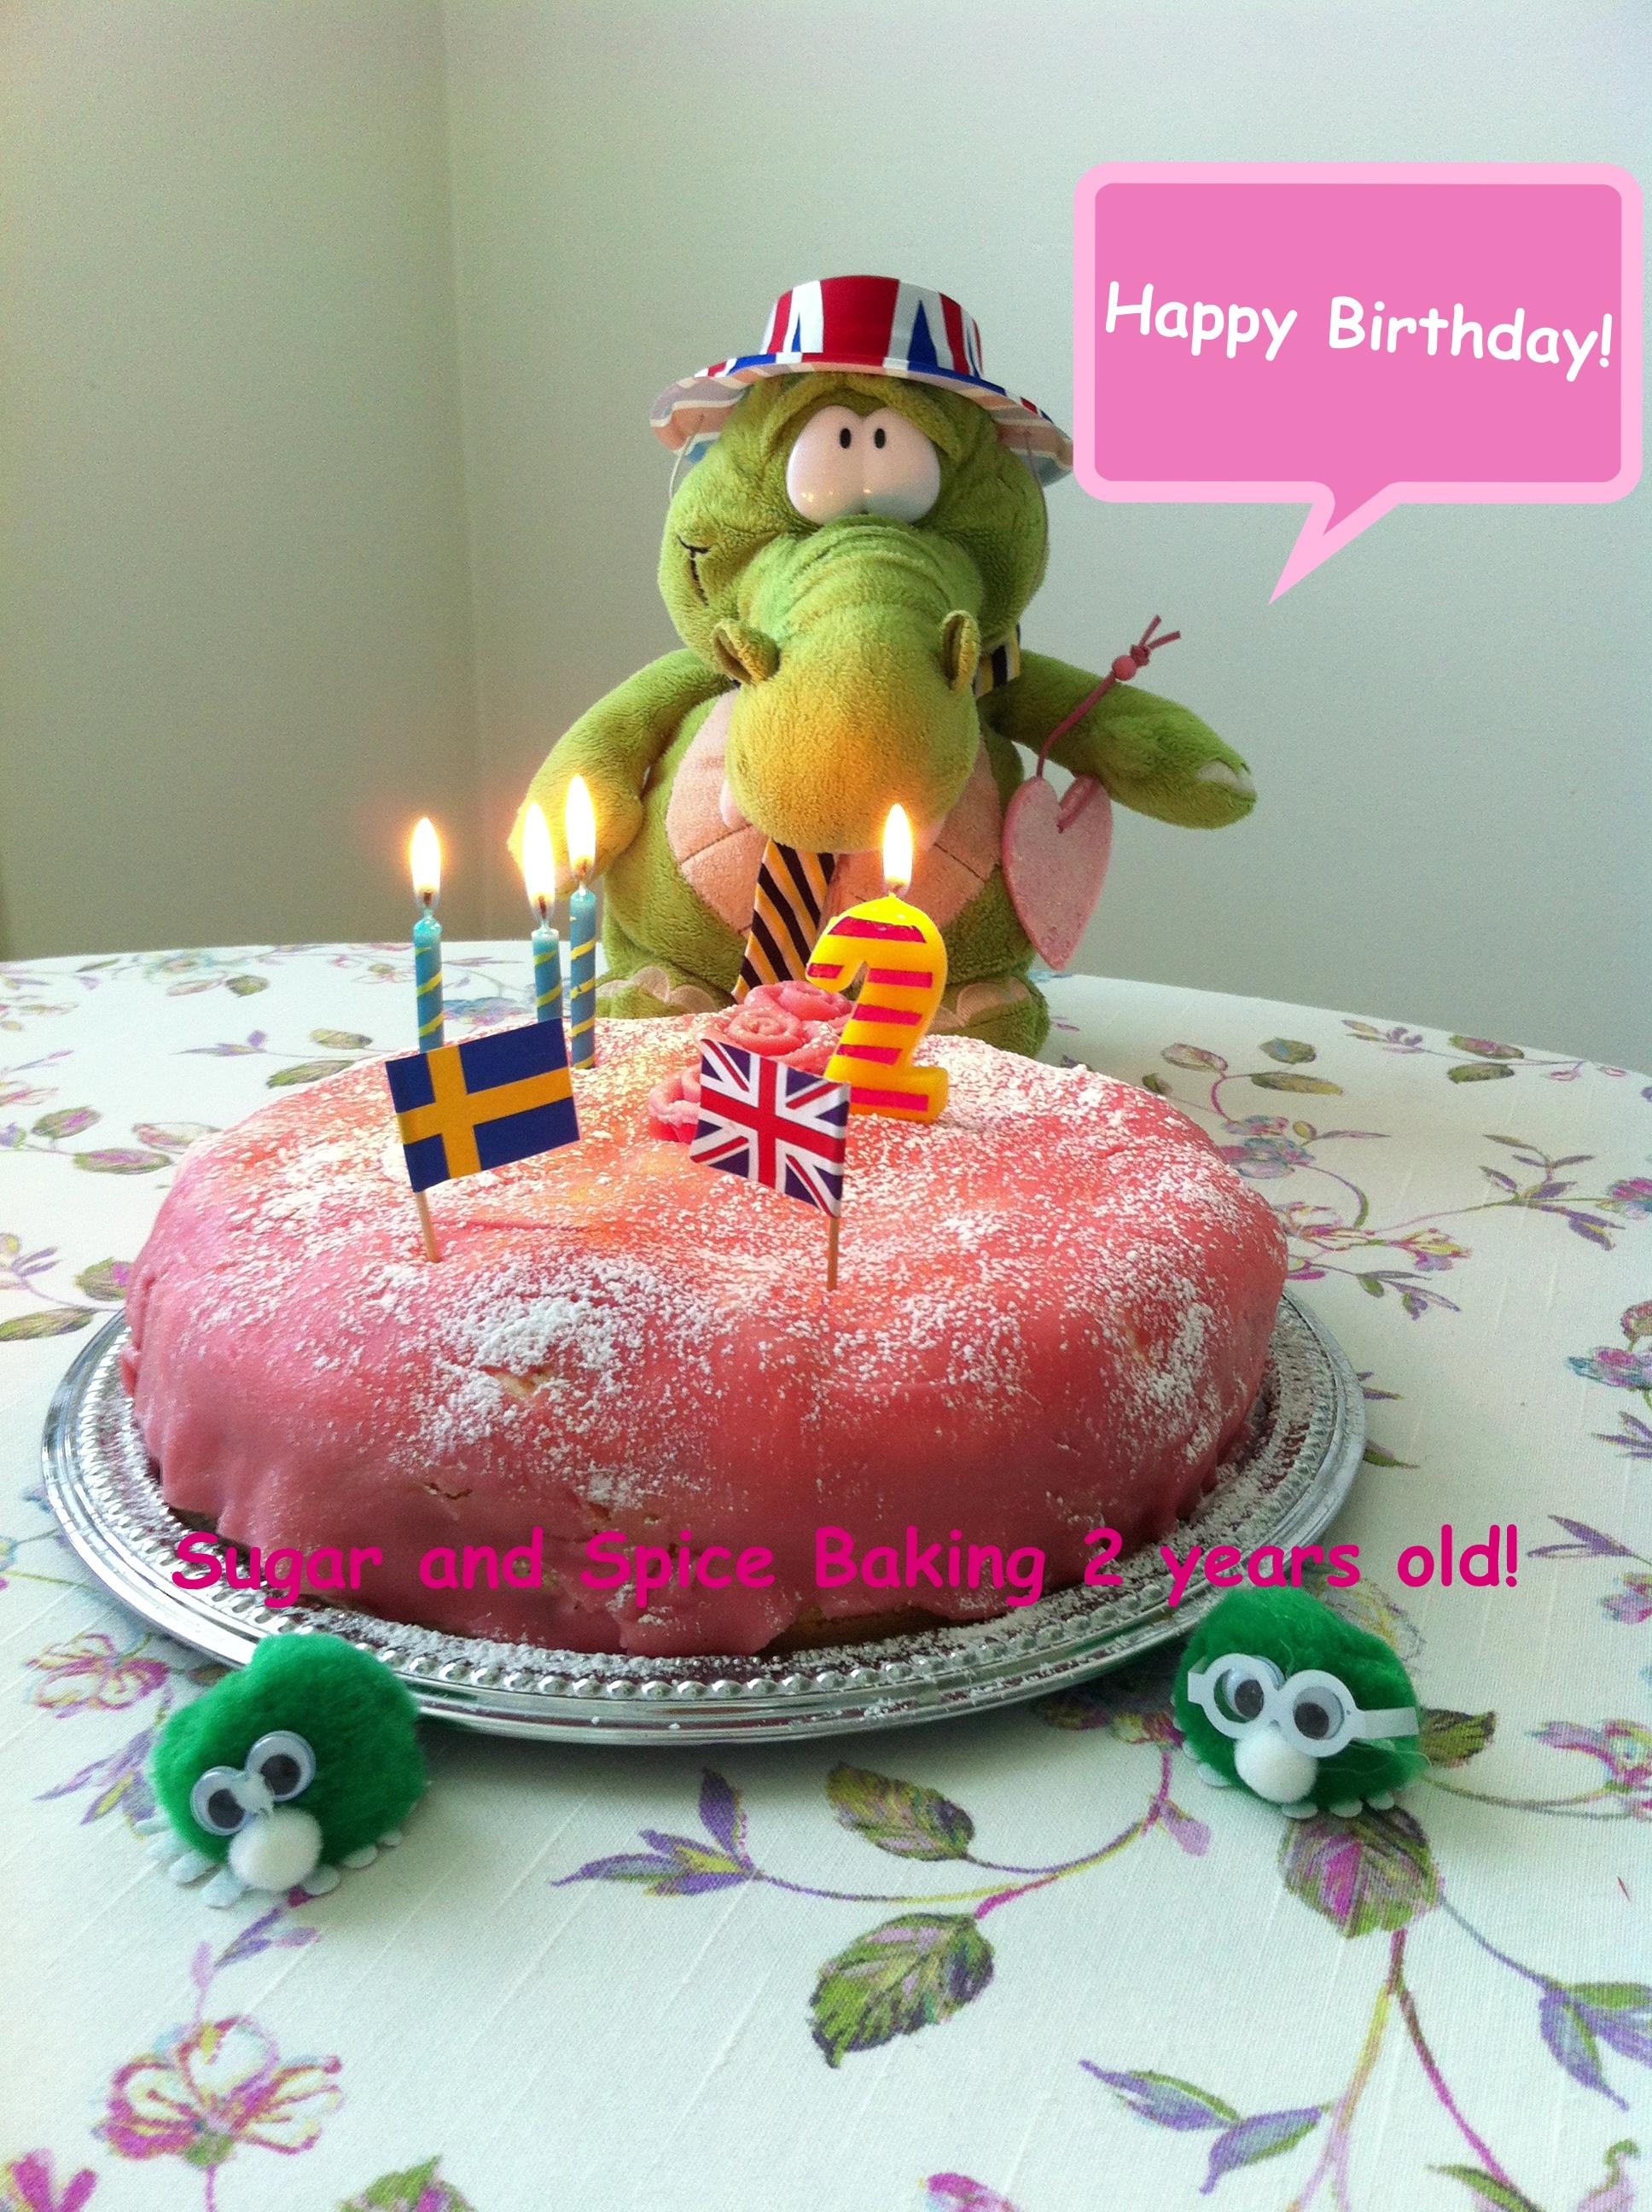 Happy Birthday Sugar And Spice Baking 2 Years Old Princess Cake